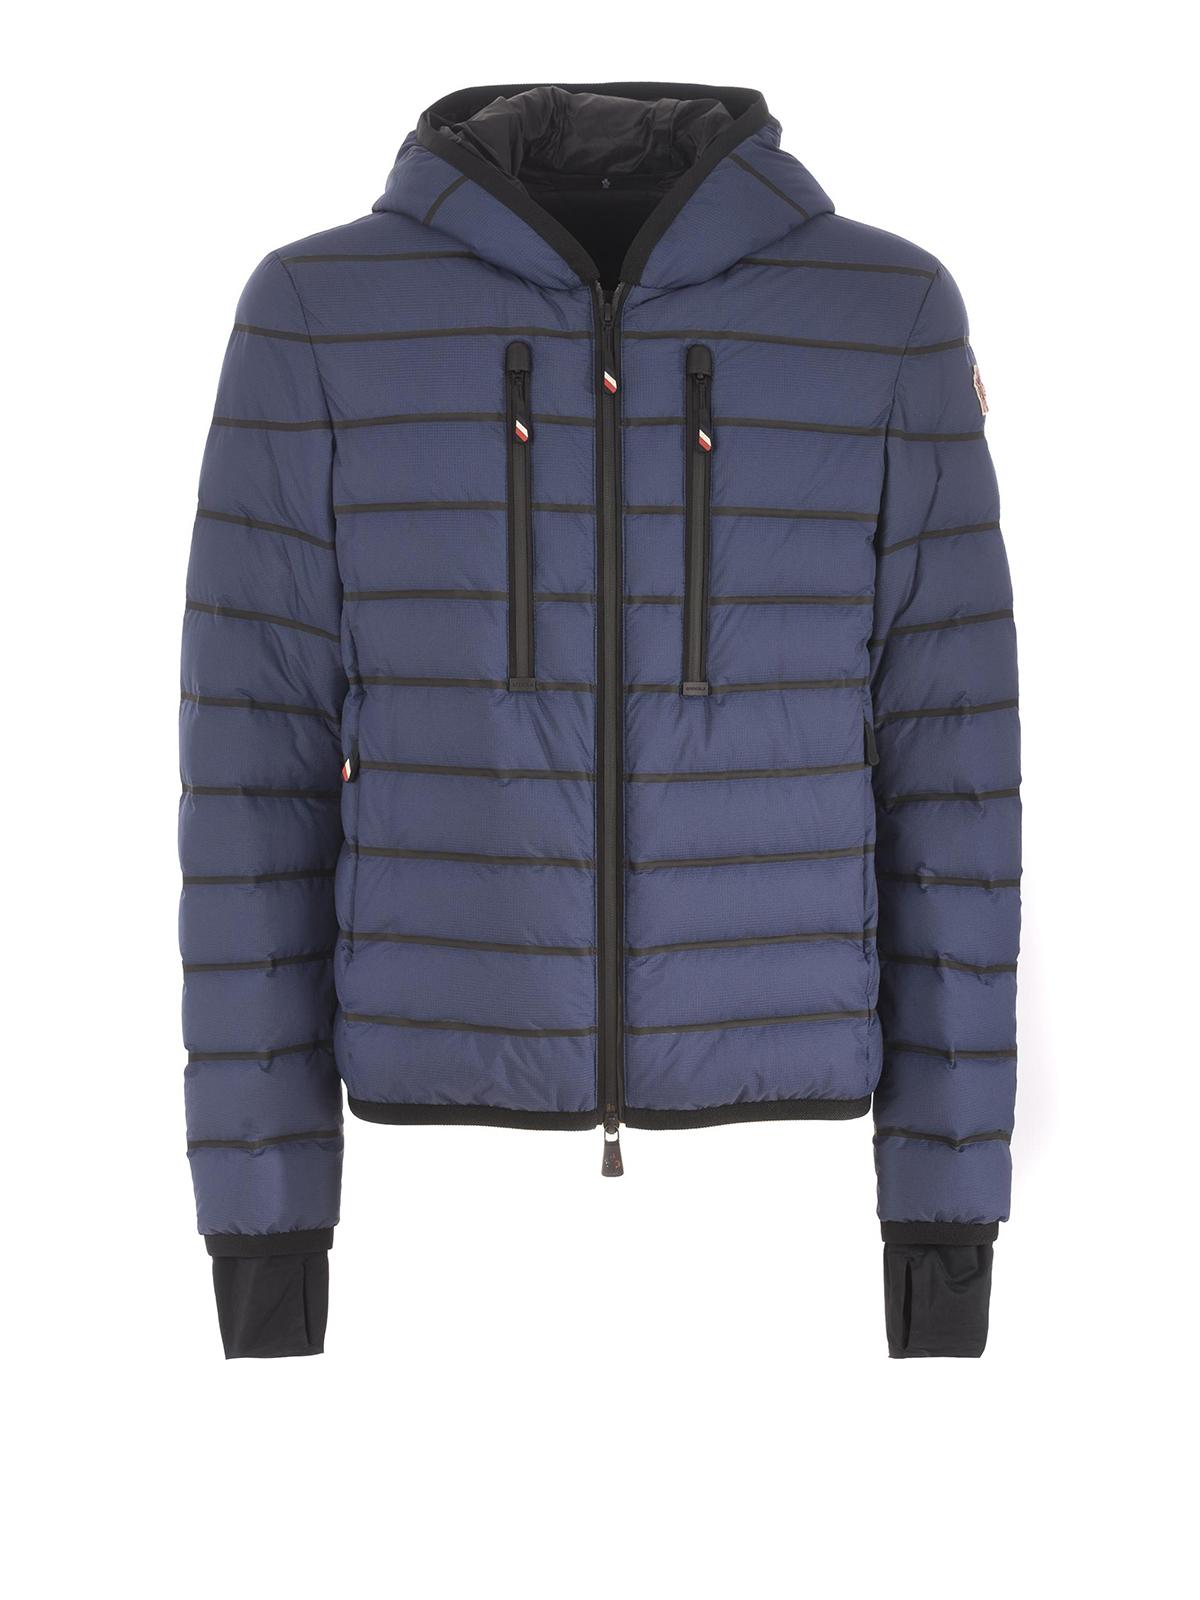 2790db667b MONCLER GRENOBLE  padded jackets - Emerald Performance   Style padded jacket